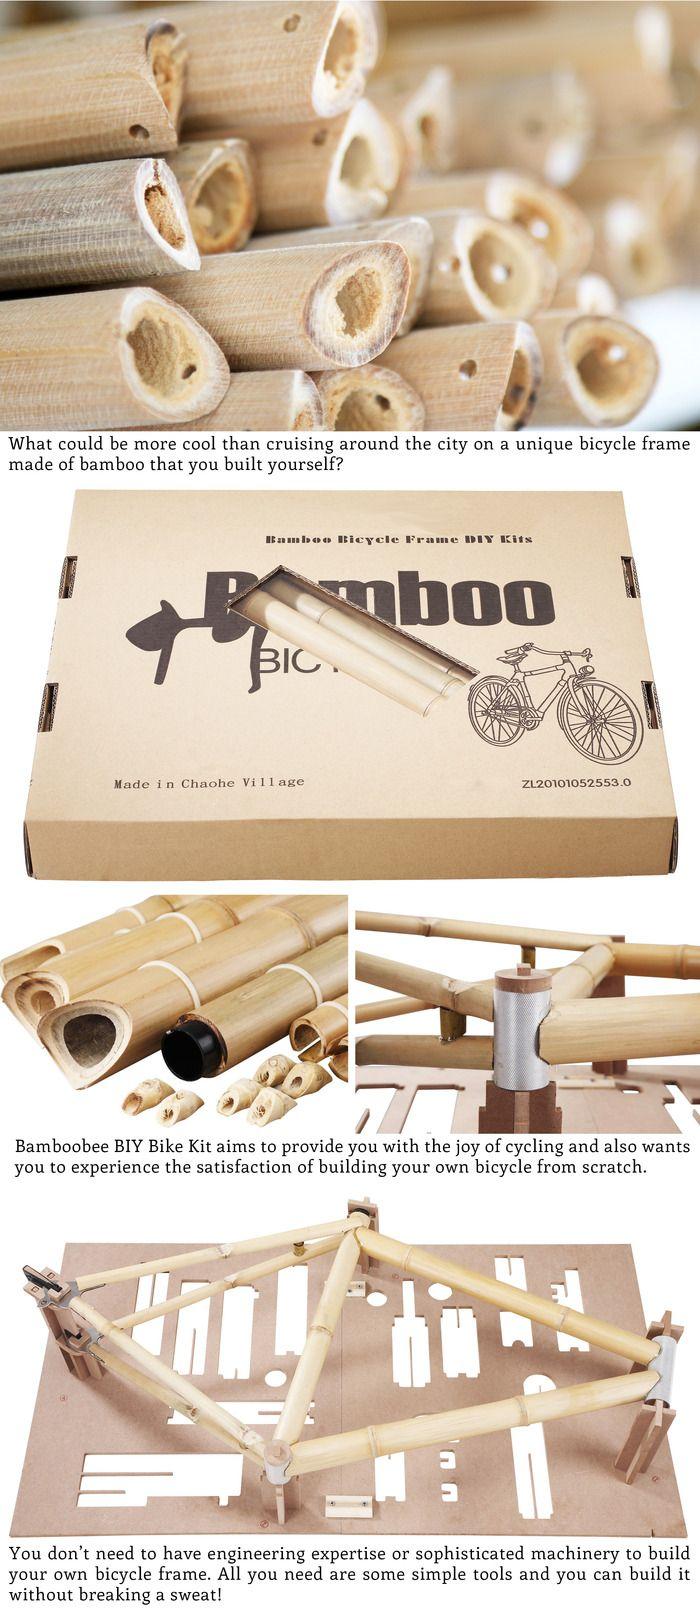 Bamboobee Build It Yourself (BIY) Bike Kit by Sunny (AhSun) Chuah — Kickstarter Check out Bamboobee Build It Yourself (BIY) Bike Kit only $169! Help make it happen on #Kickstarter https://www.kickstarter.com/projects/817362809/bamboobee-build-it-yourself-biy-bike-kit